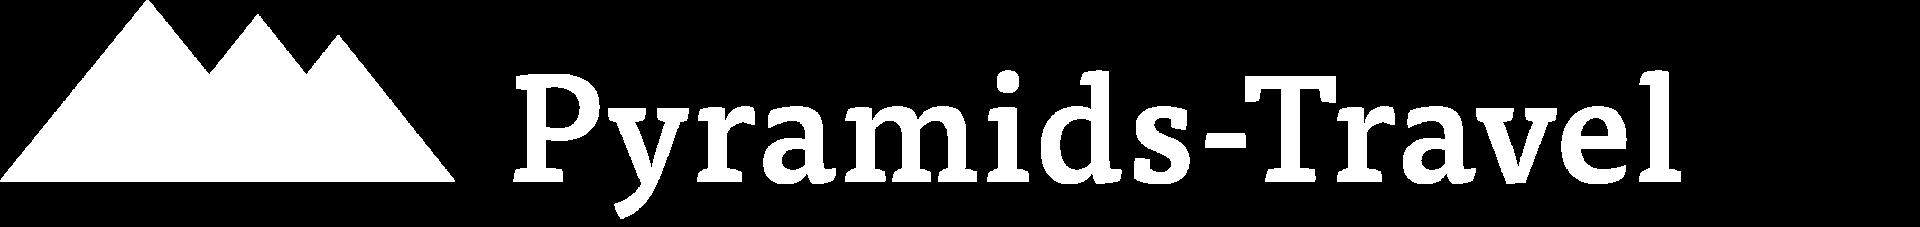 Logo Pyramids-Travel w